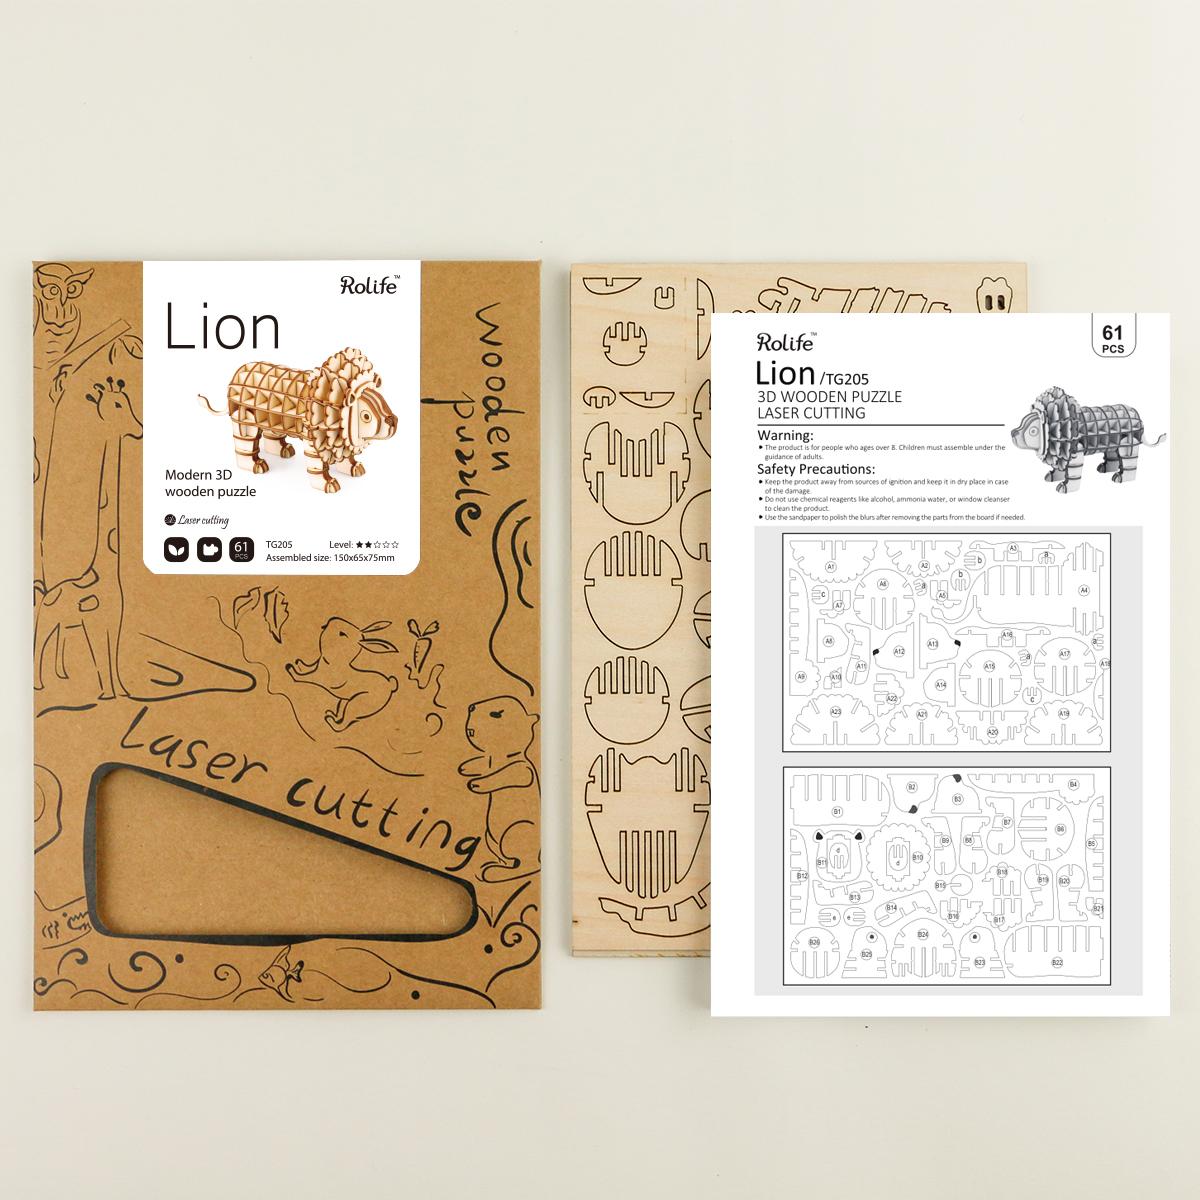 Lion TG205